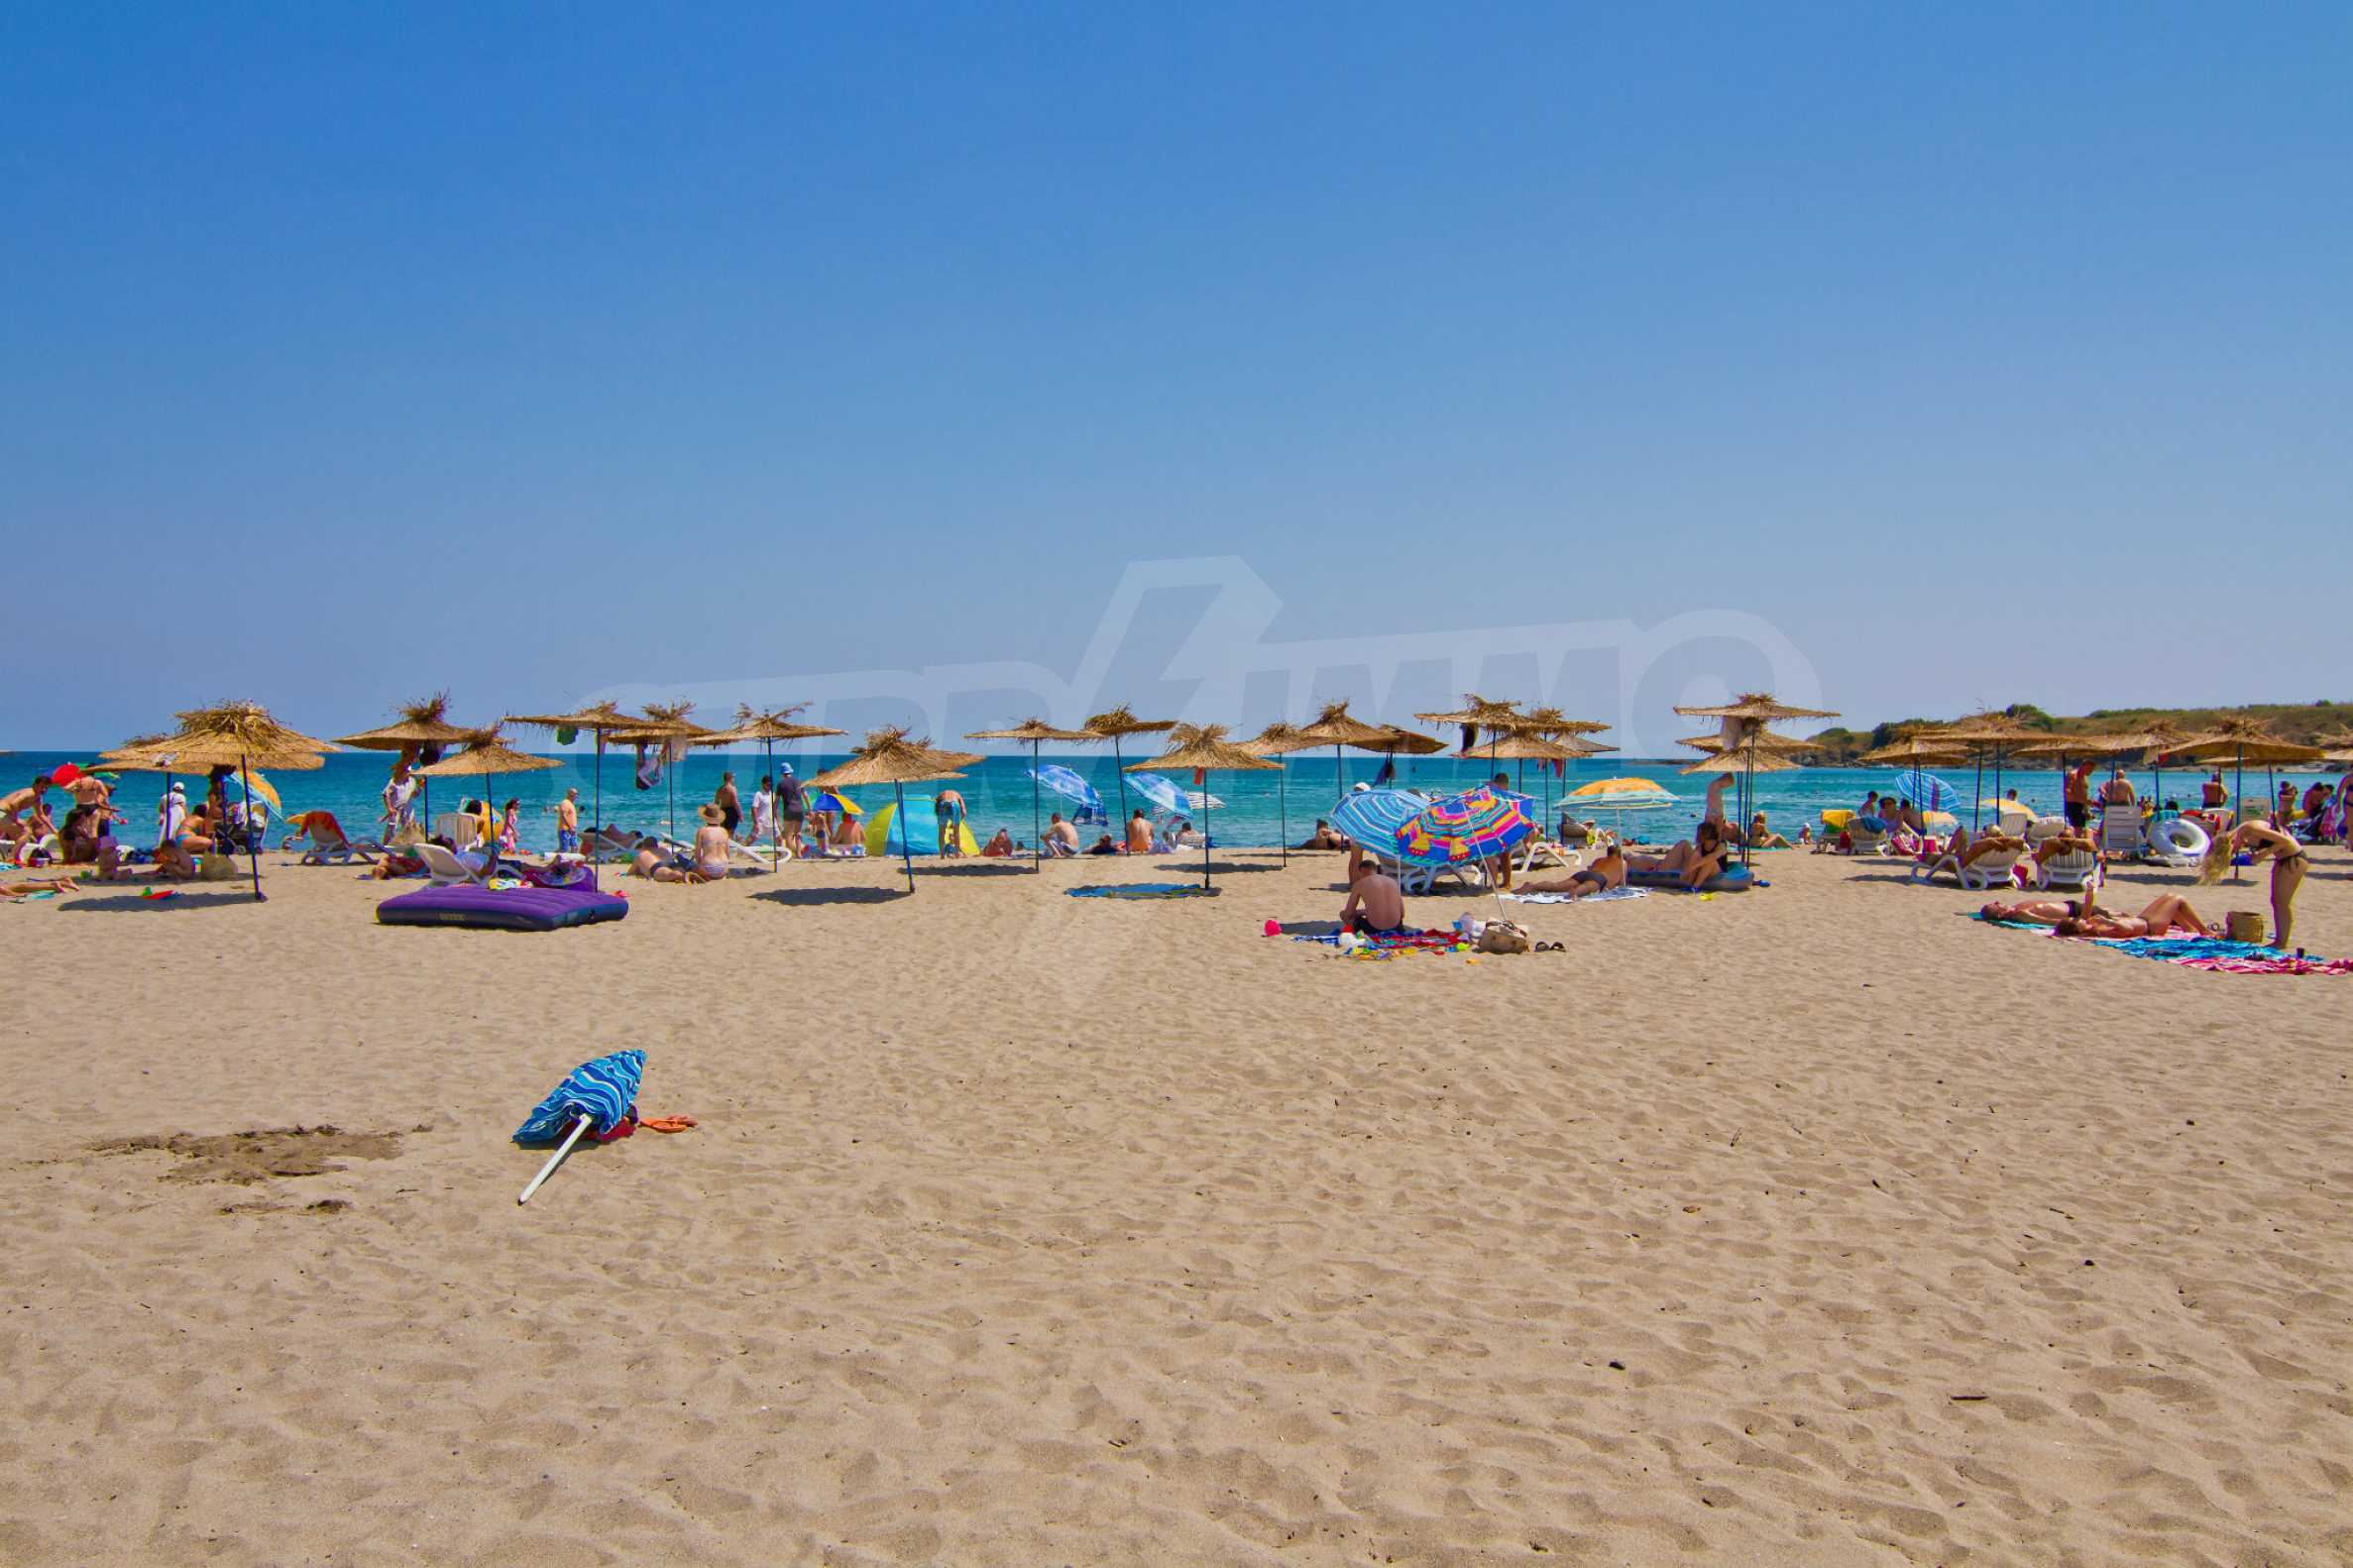 Примеа Бийч Резиденс / Primea Beach Residence 11